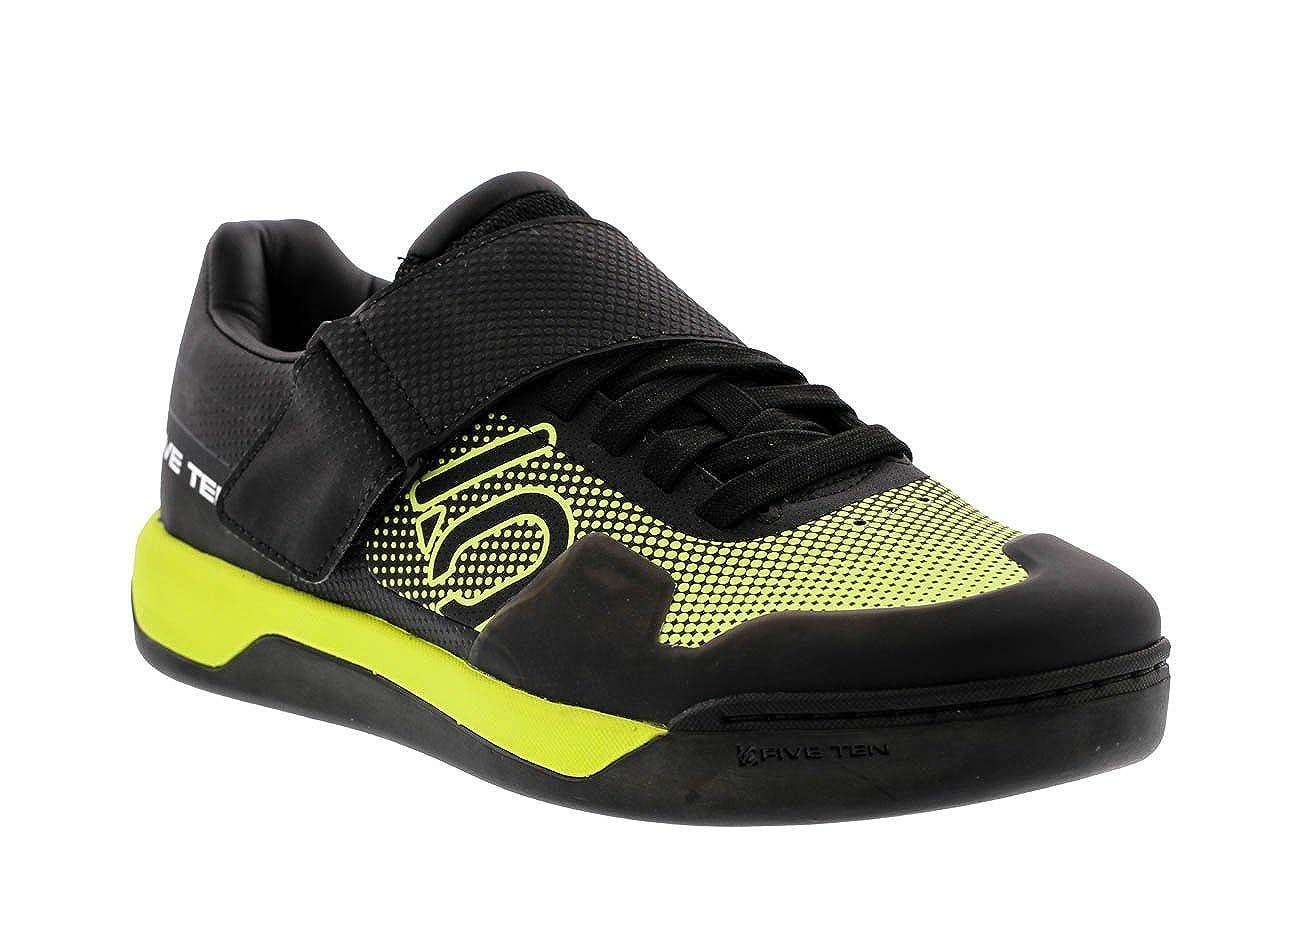 Five Ten Hellcat Pro Men 's Clipless MTB靴 B01GHMUZ2M 8 D(M) US イエロー イエロー 8 D(M) US